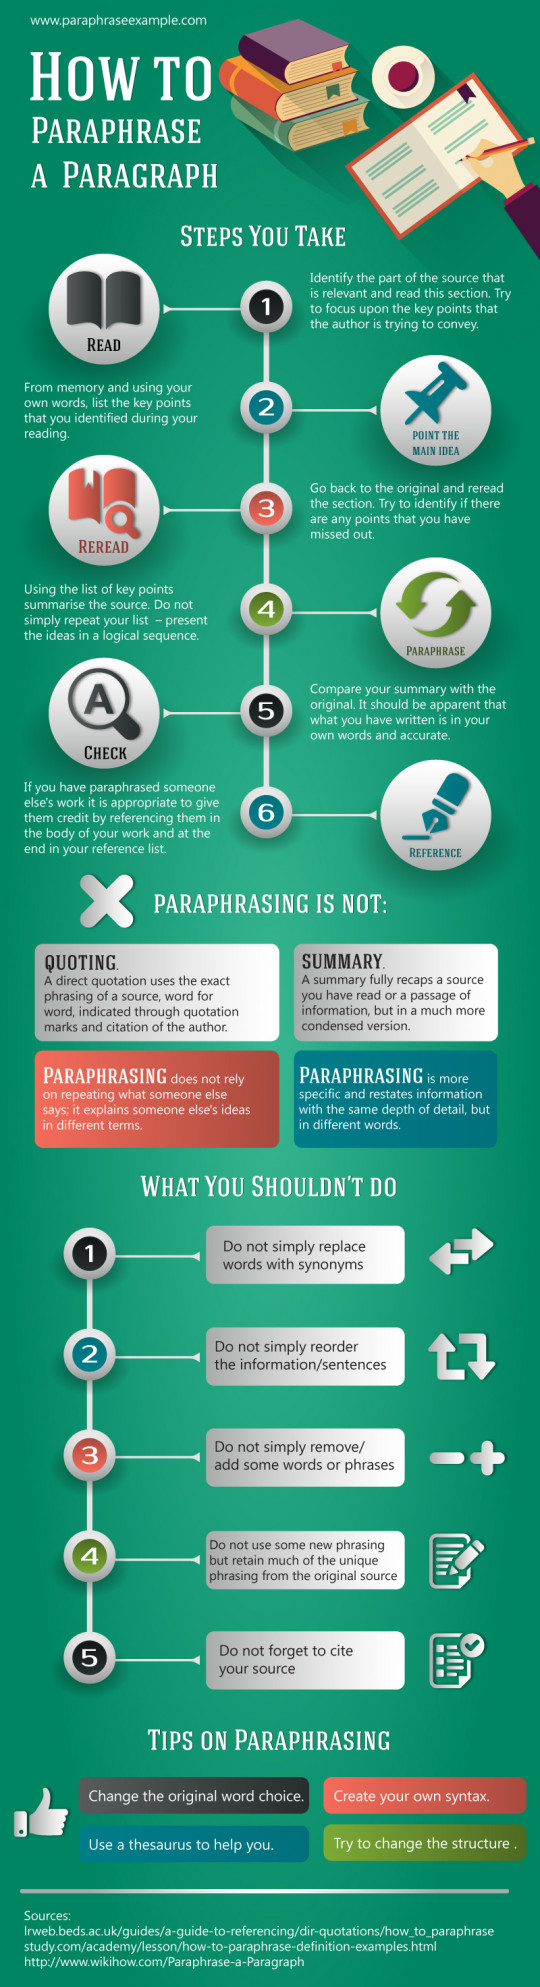 How to Paraphrase a Paragraph